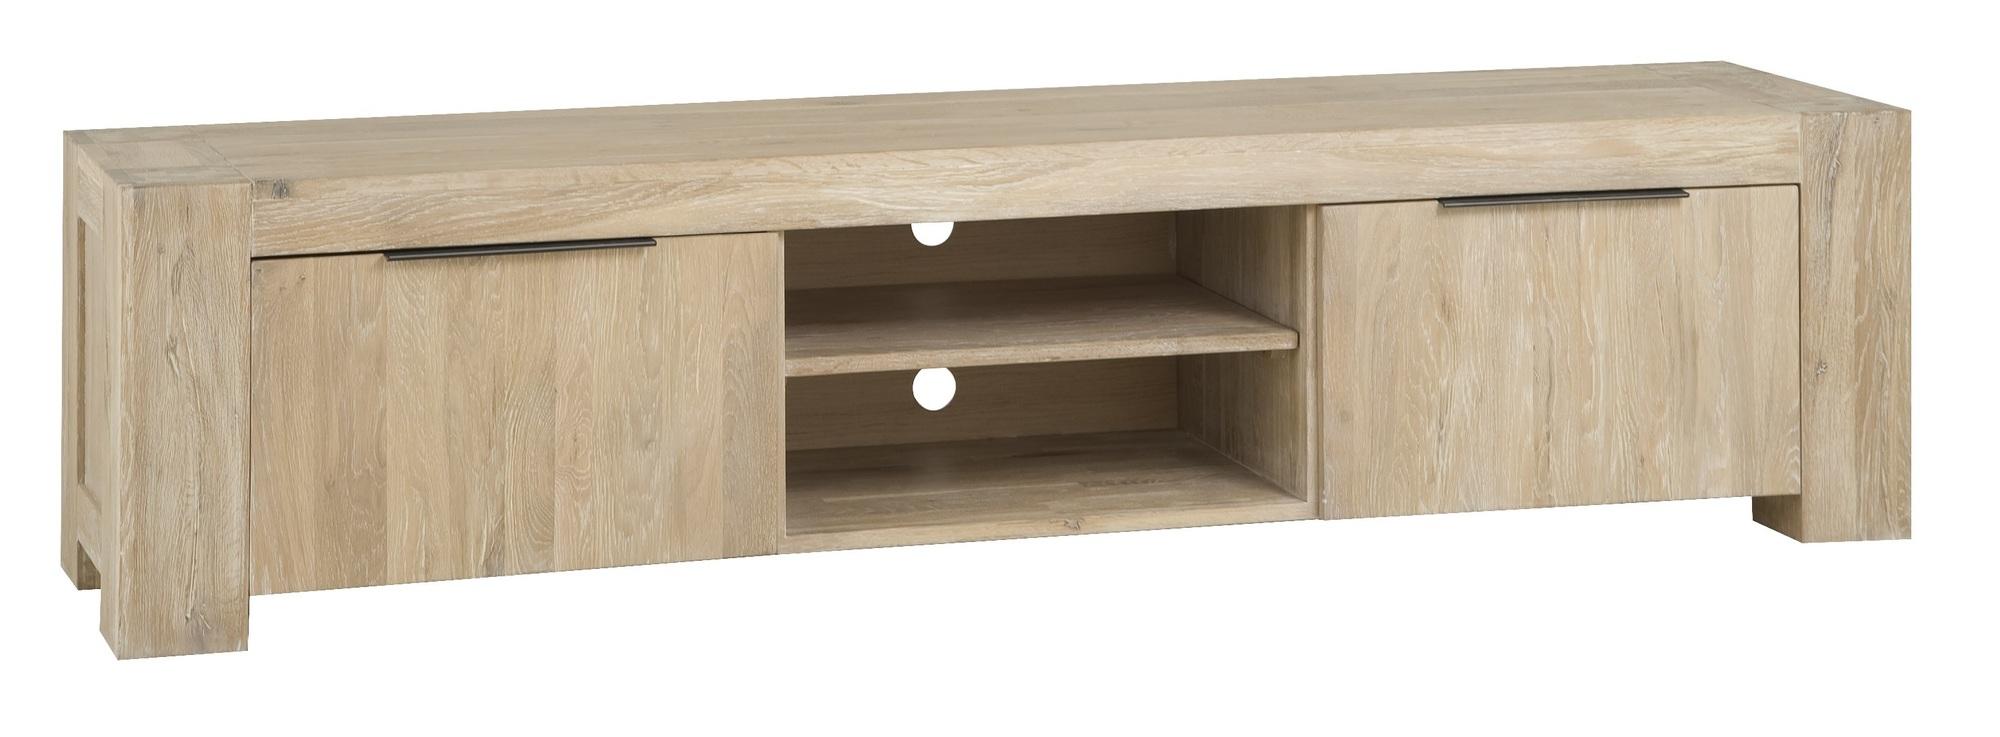 kast-luuk-tv dressoir-towerlving-BM 1011-210cm-eiken-whitewash-deurtjes-planken